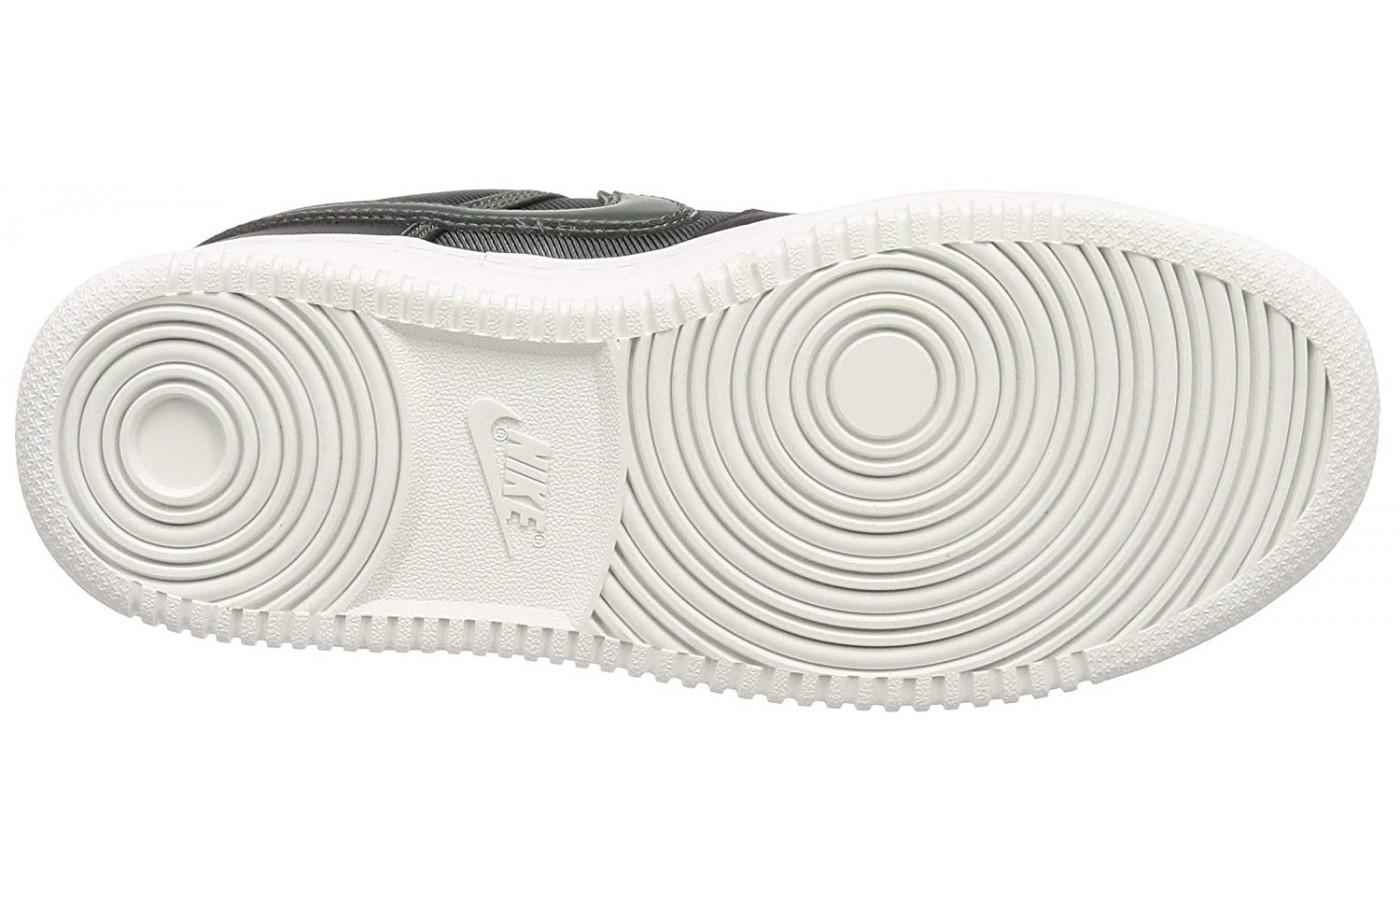 Nike Vandal 2k Sole